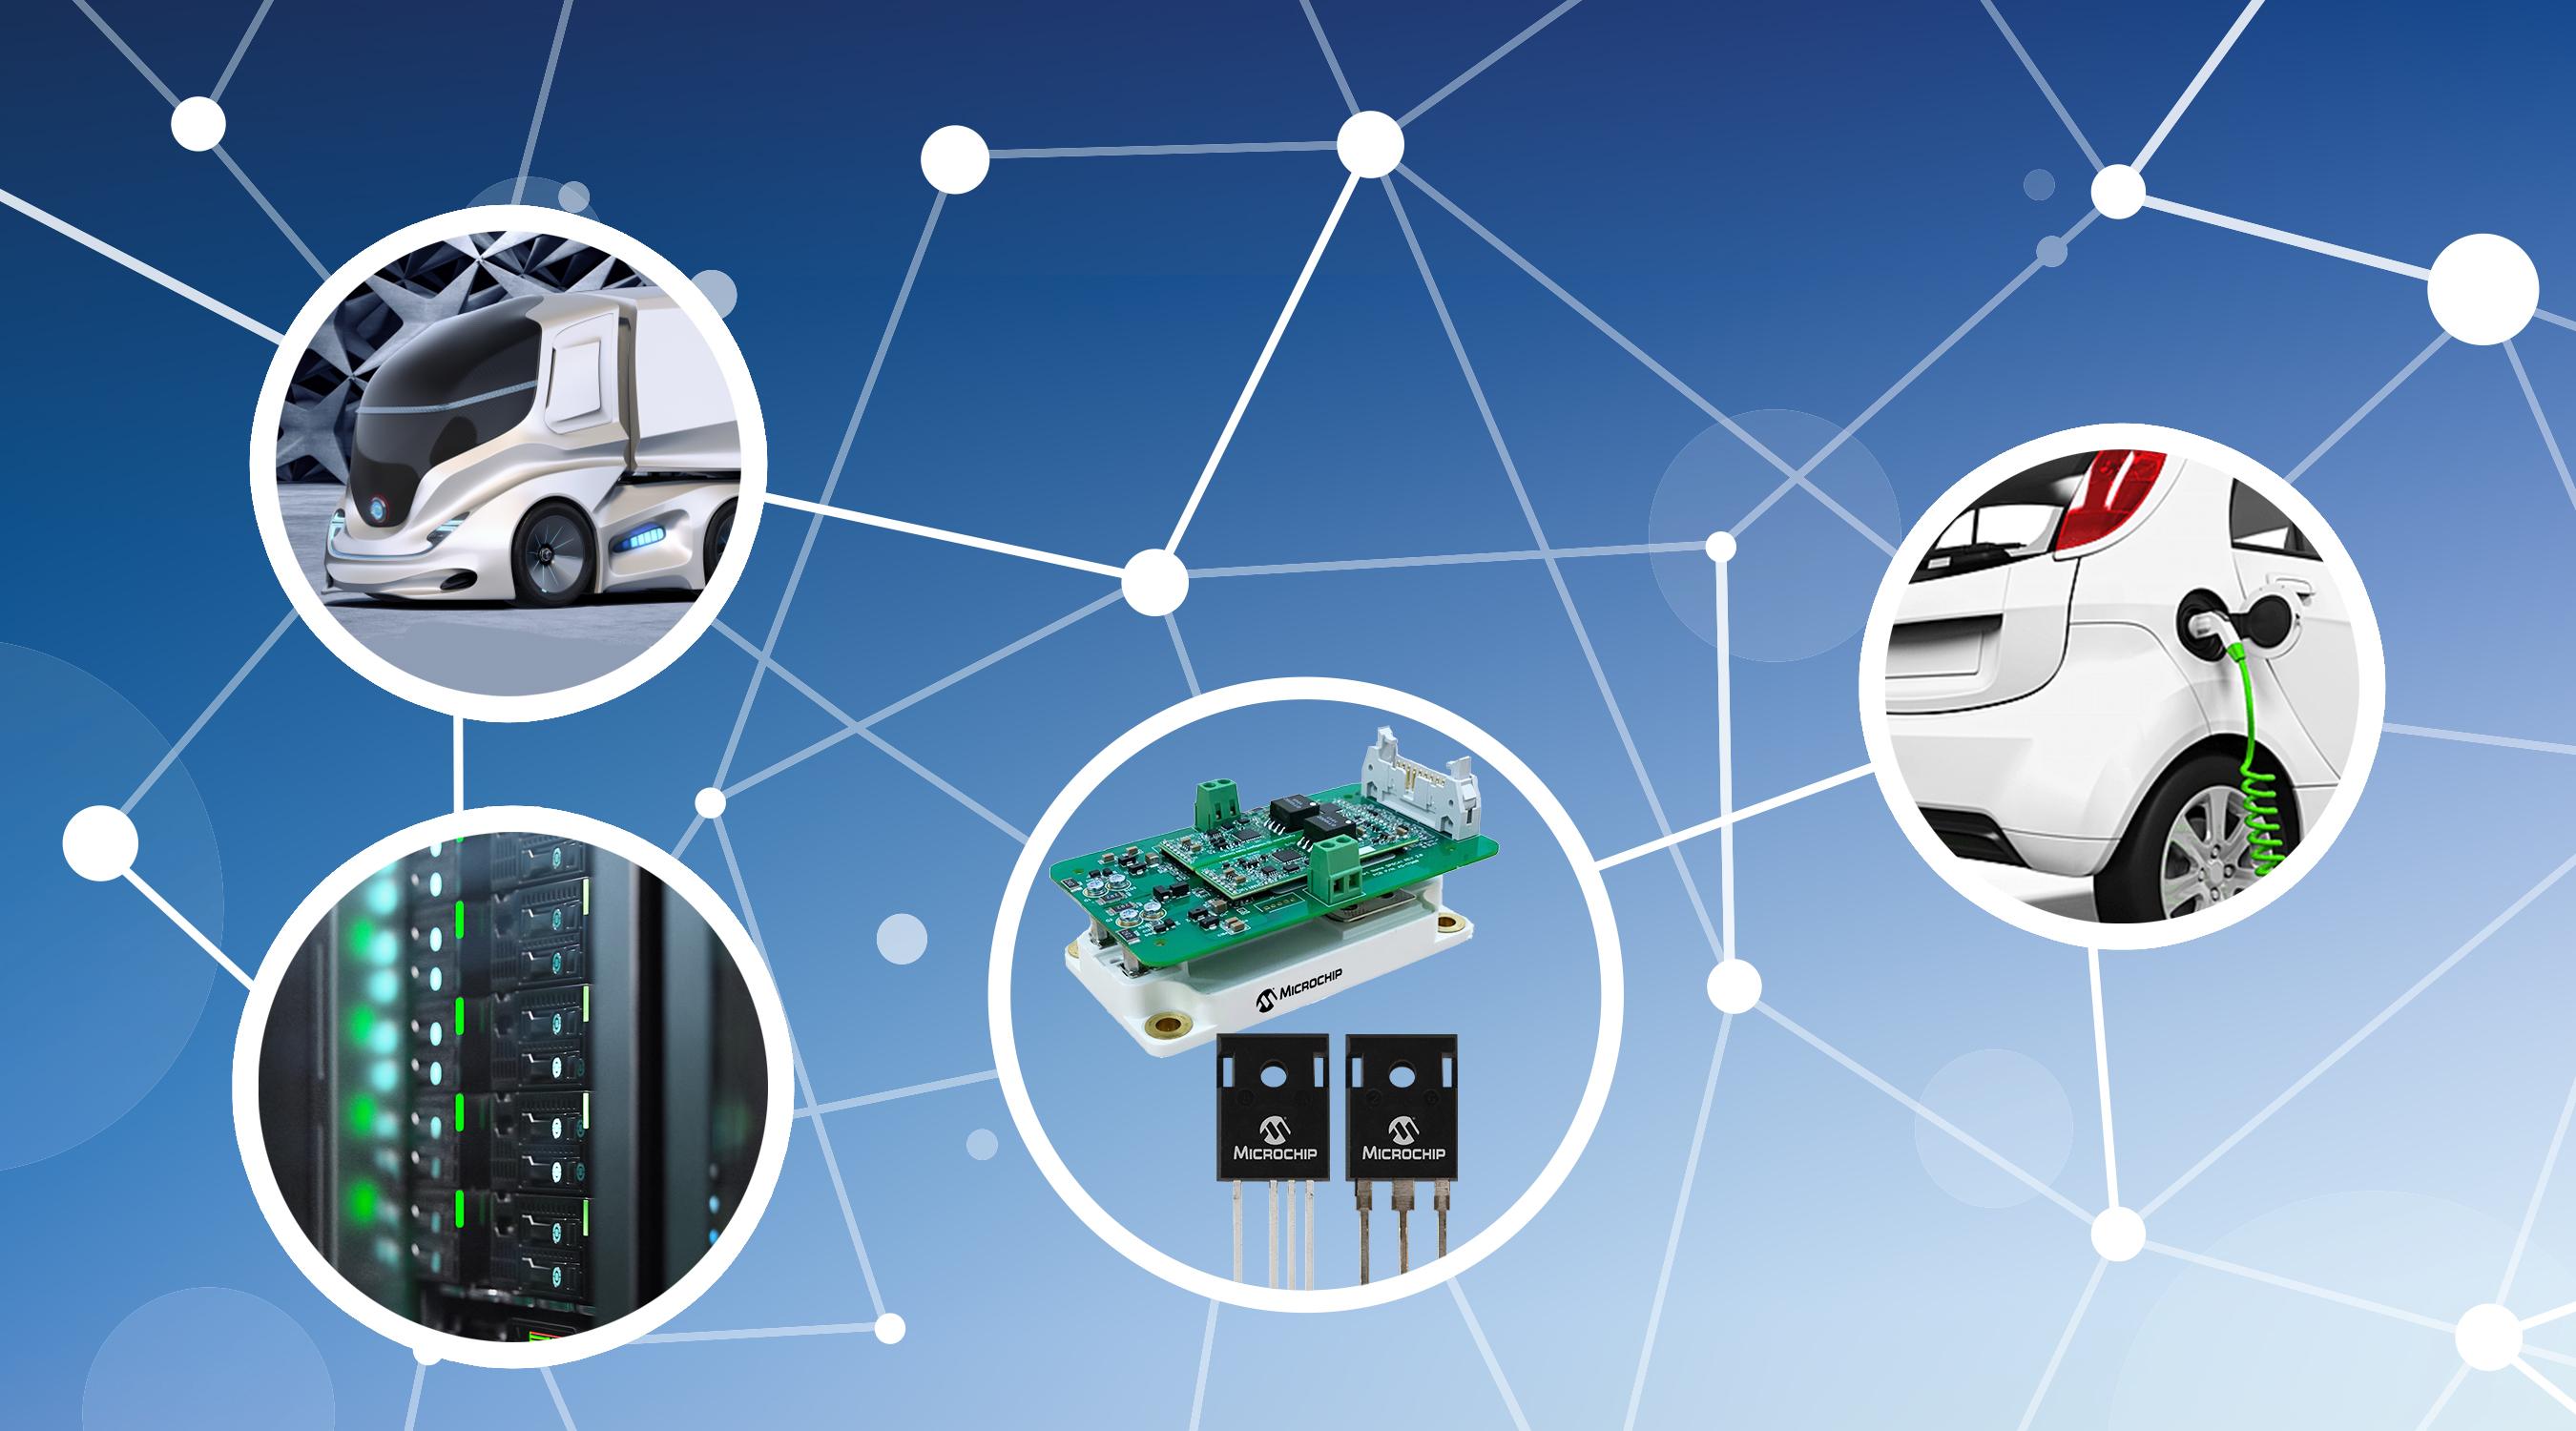 Microchip推出业界耐固性最强的碳化硅功率解决方案,取代硅IGBT,现已提供1700V版本